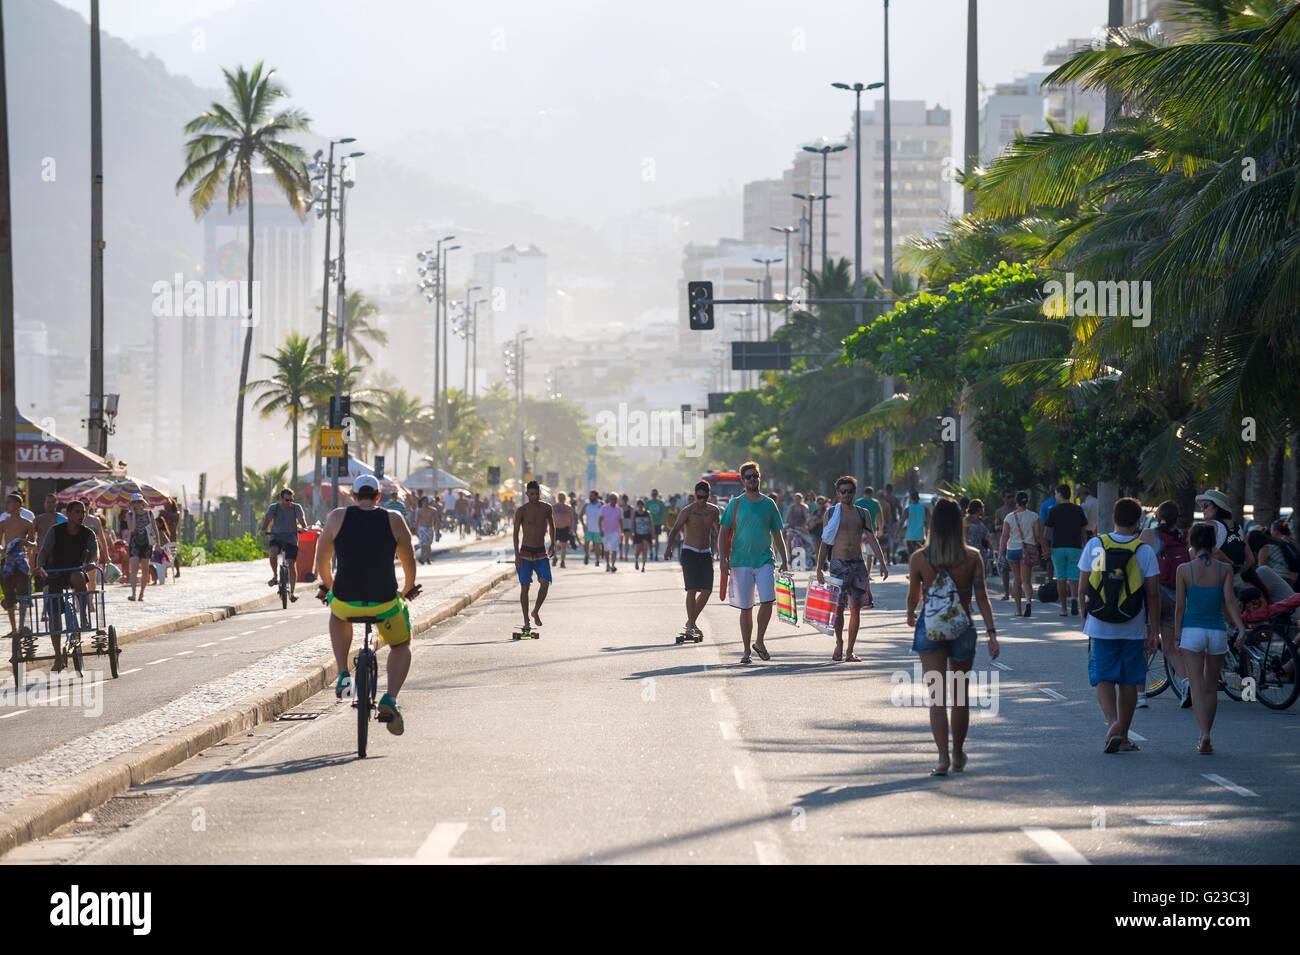 RIO DE JANEIRO - le 6 mars 2016: Les cyclistes partagent l''Avenida Vieira Souto street avec des piétons Photo Stock